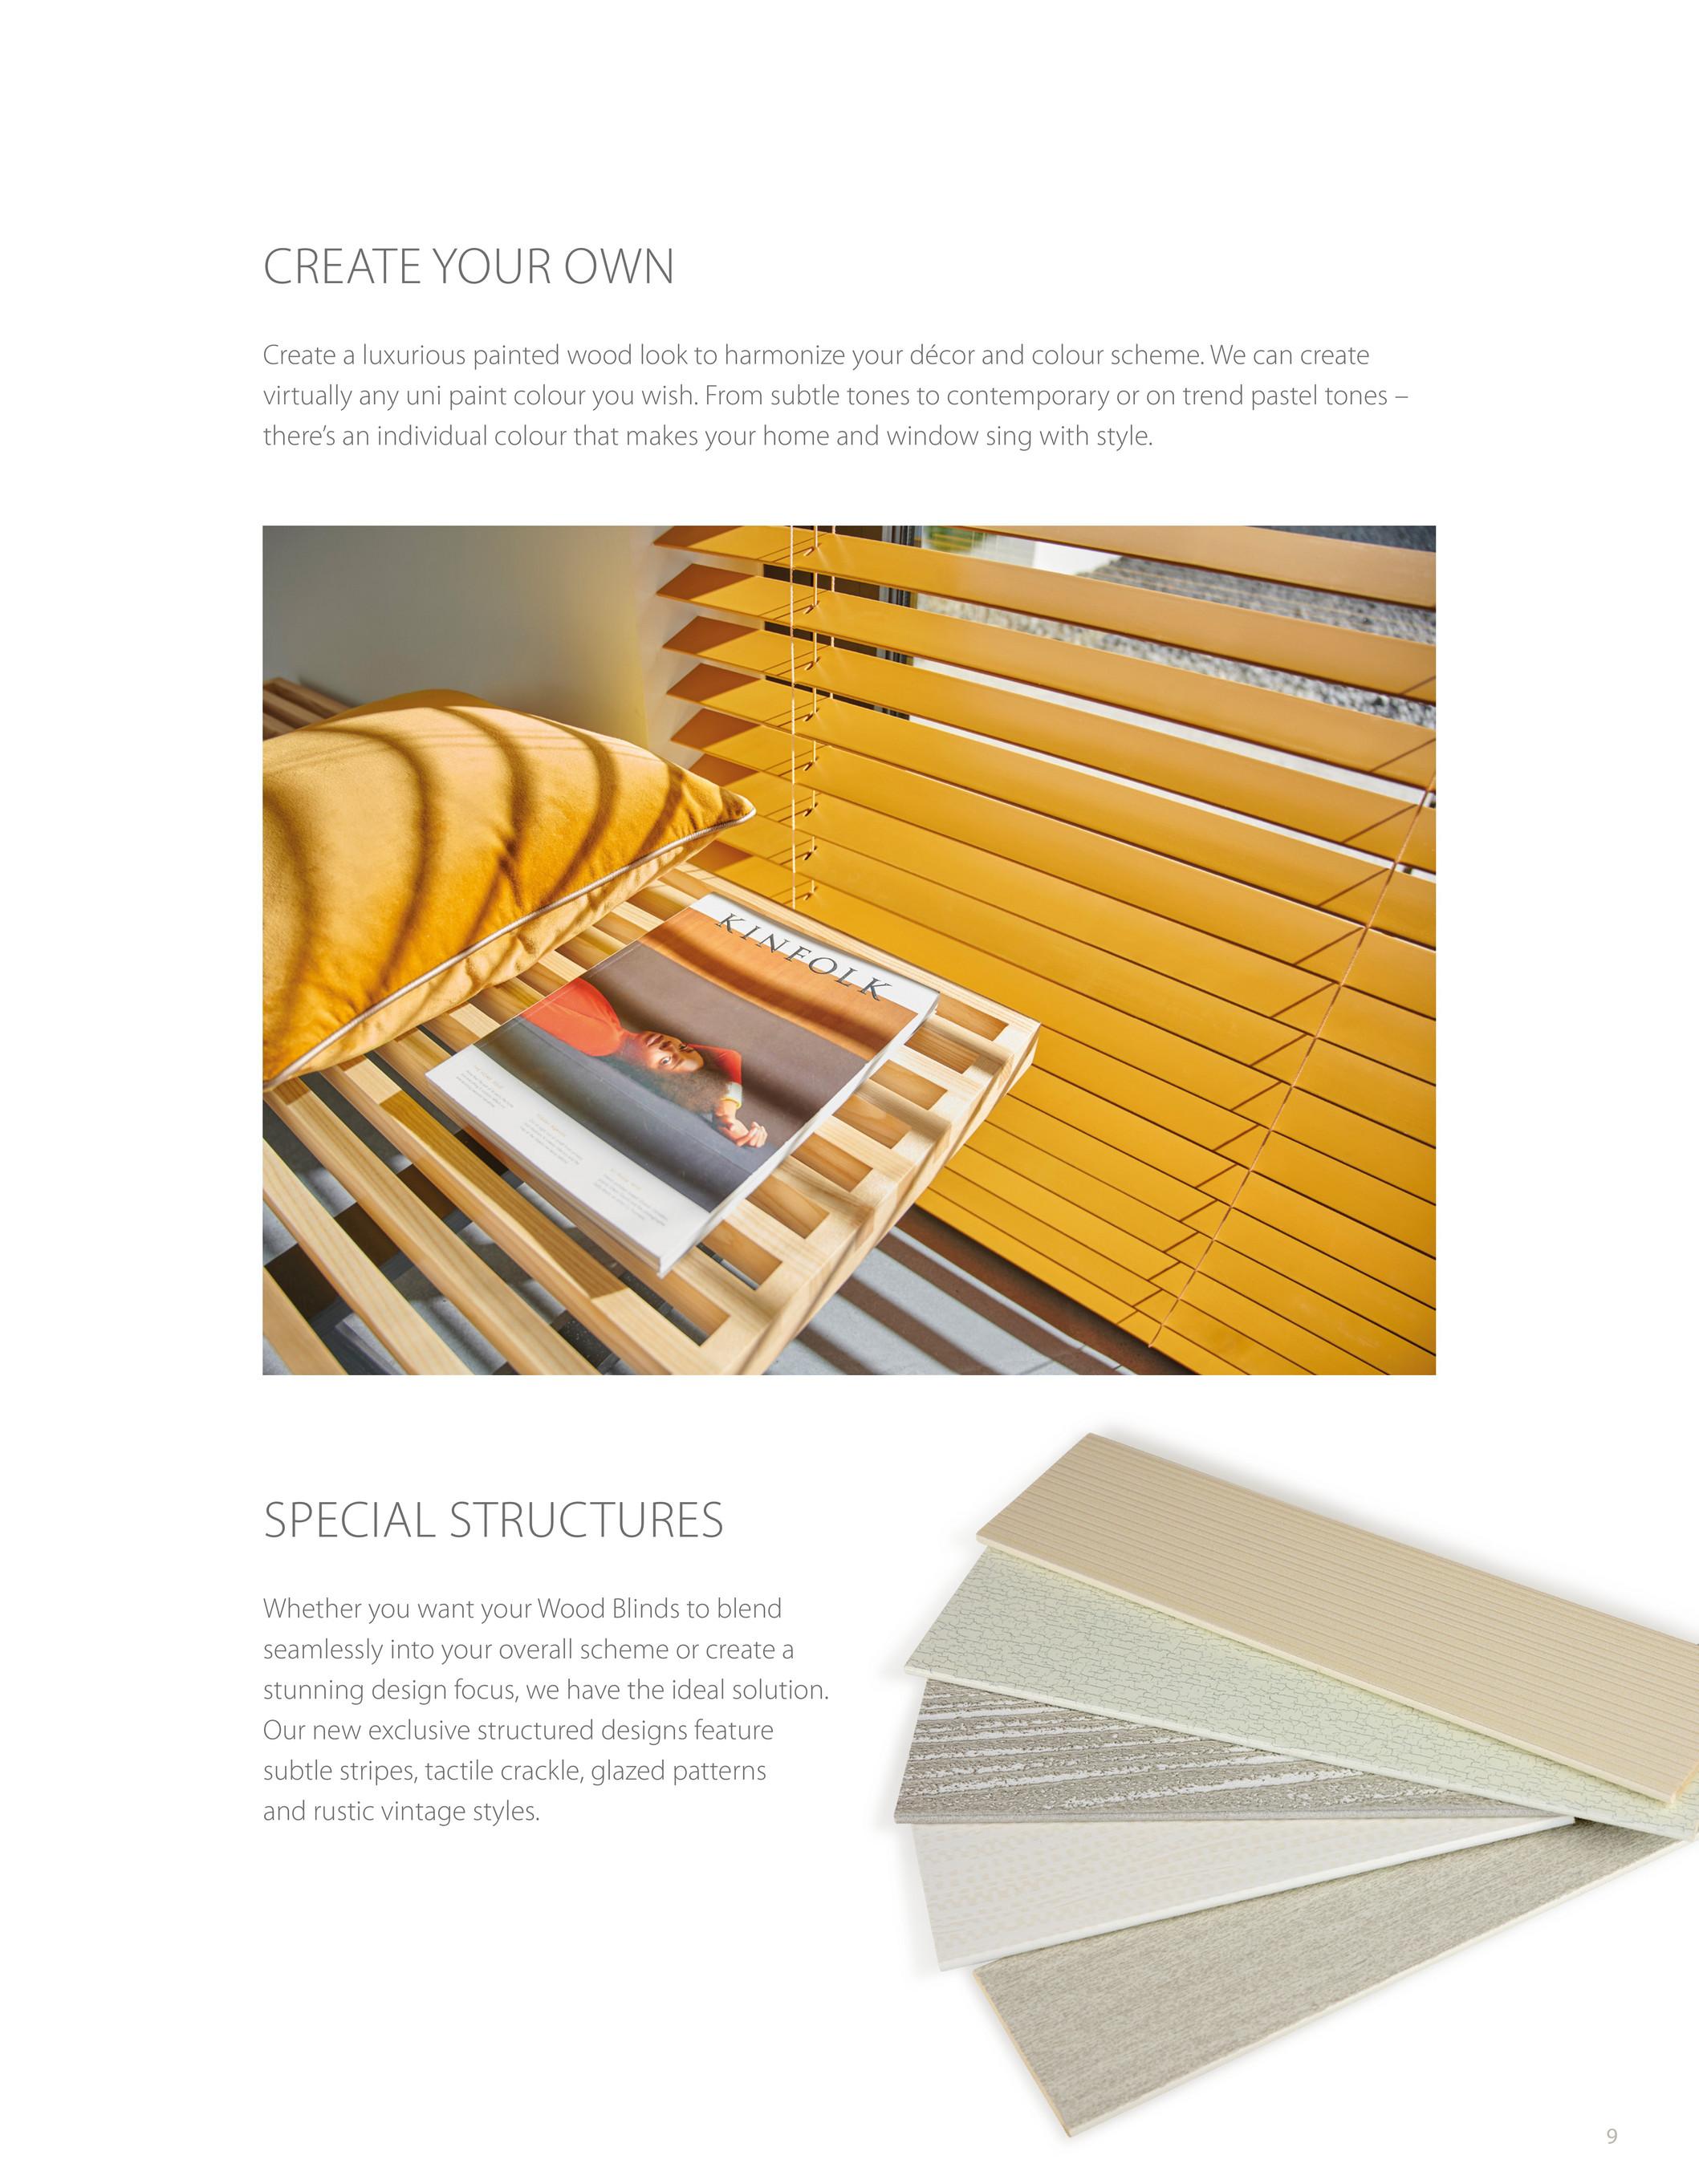 Luxaflex Uk Luxaflex Wood Blinds Inspiration